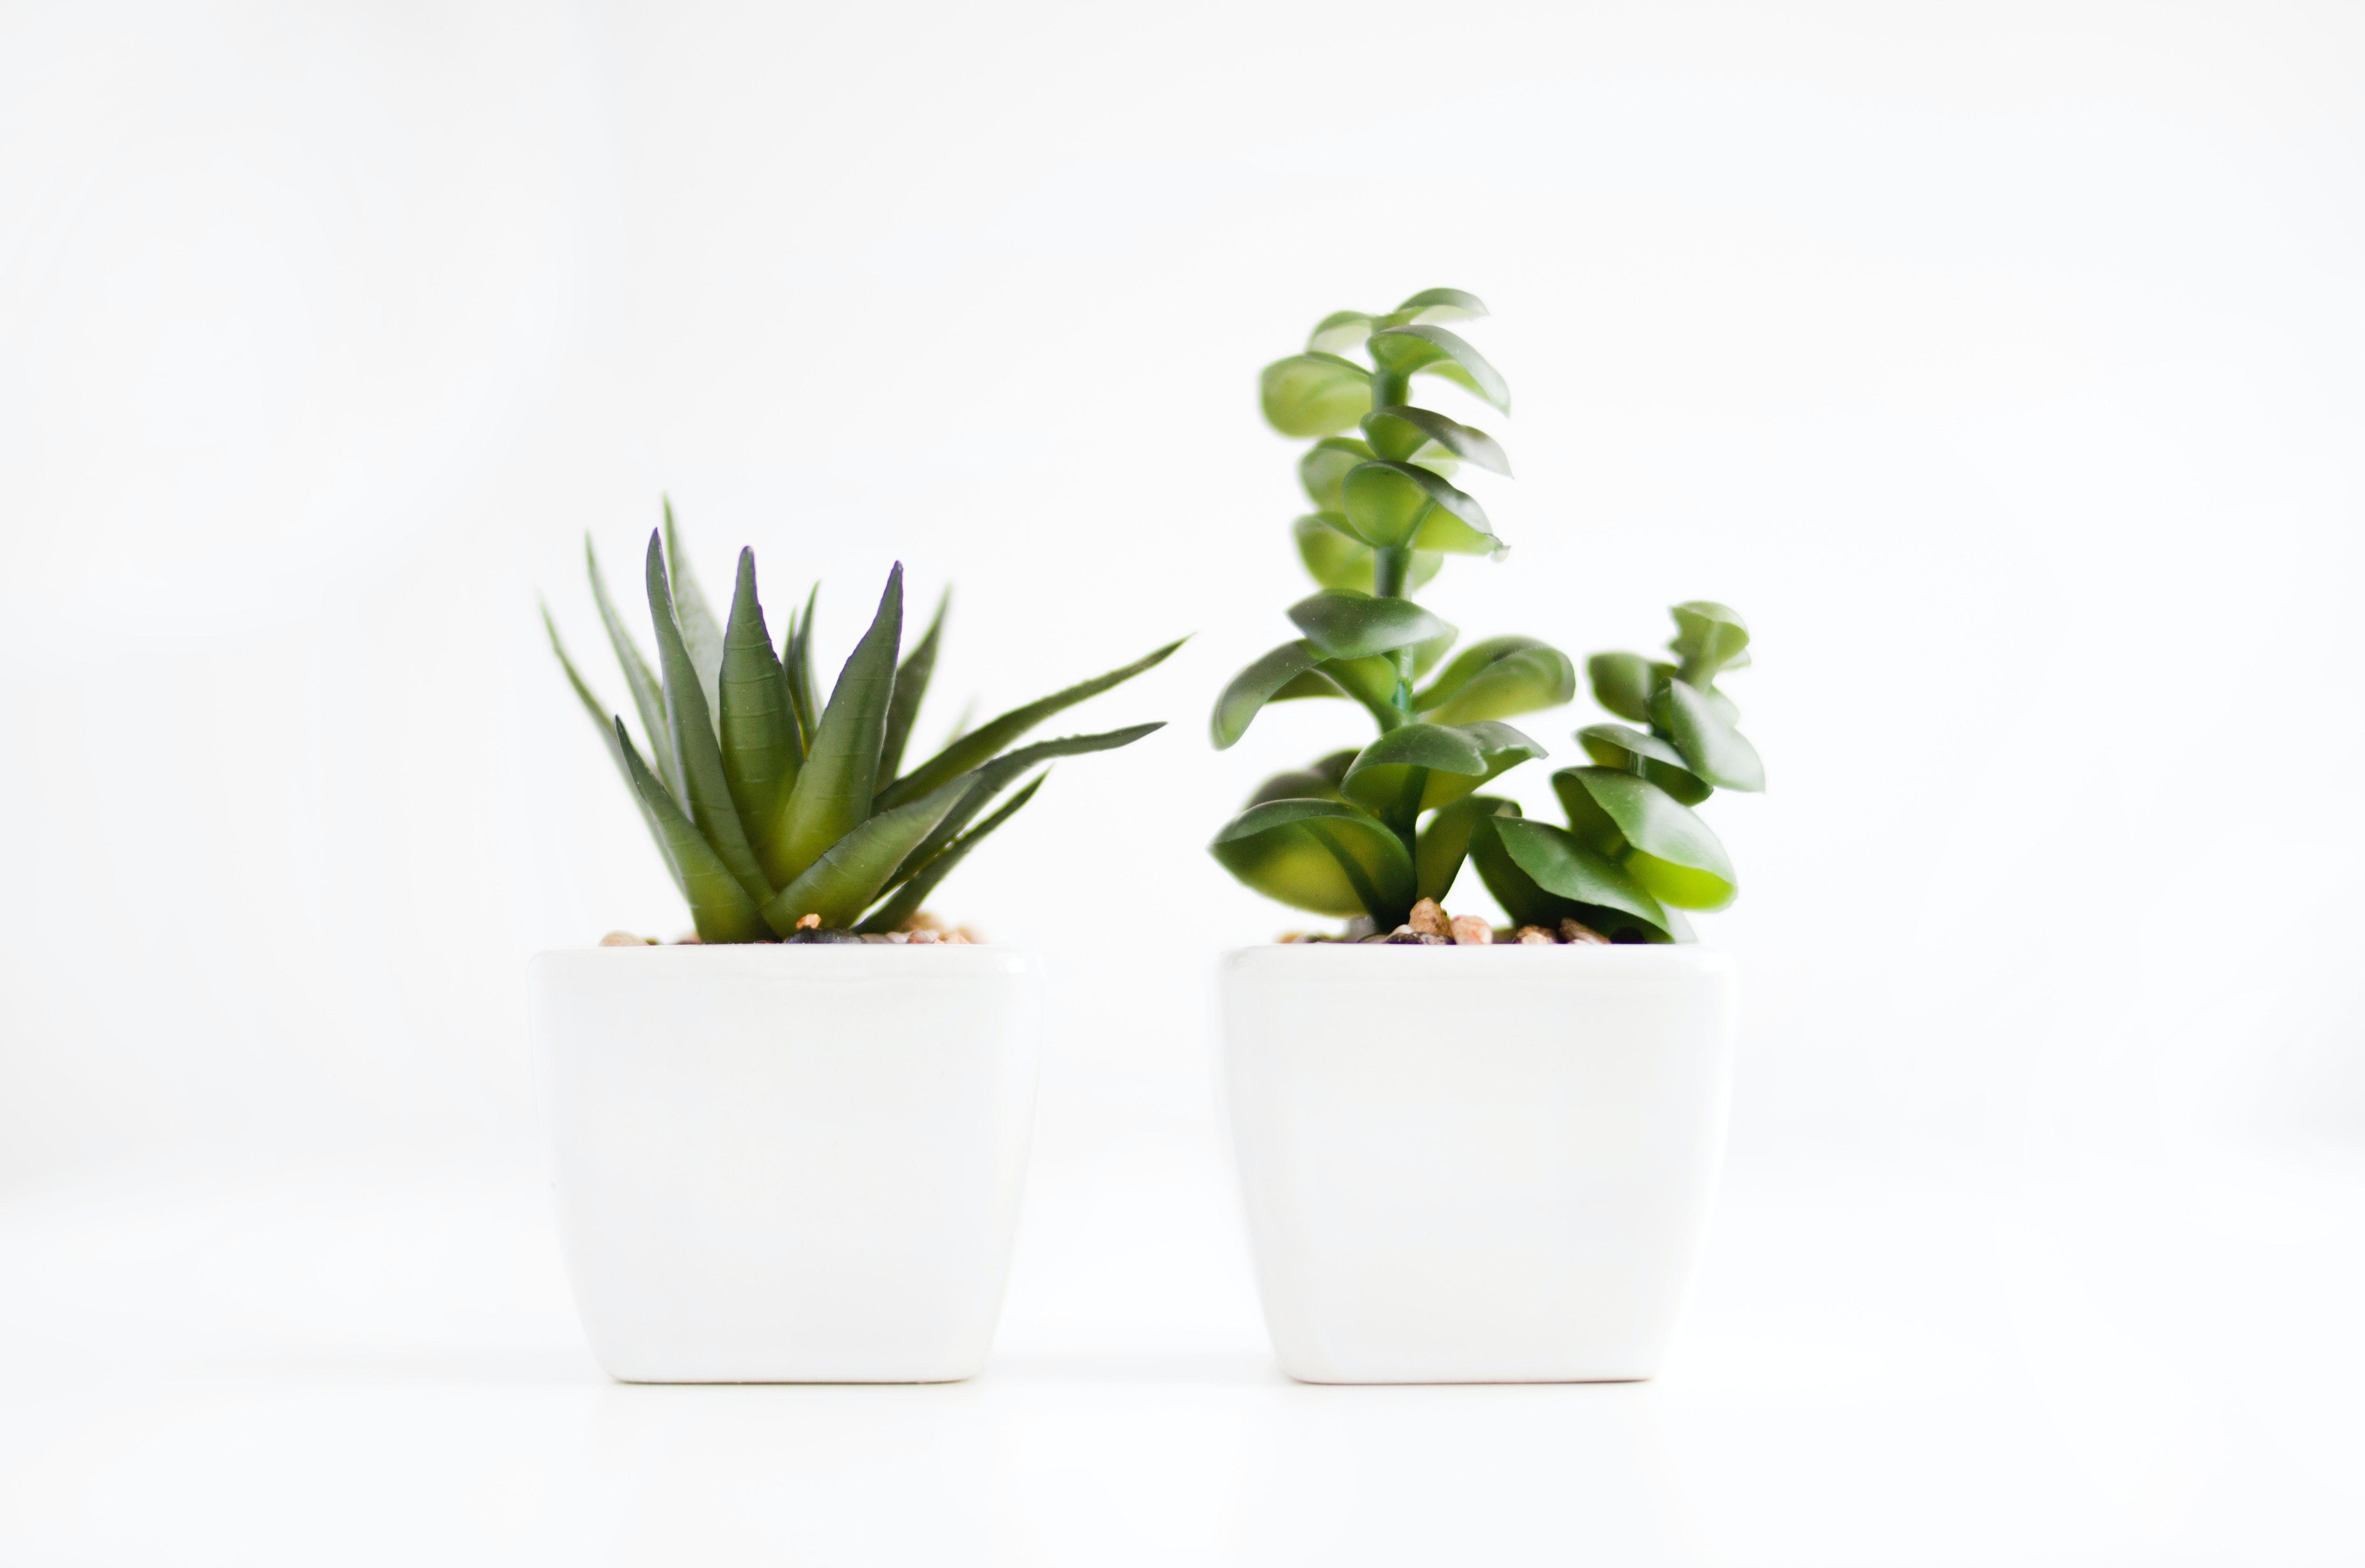 Free stock photo of minimalism, minimalist, plant